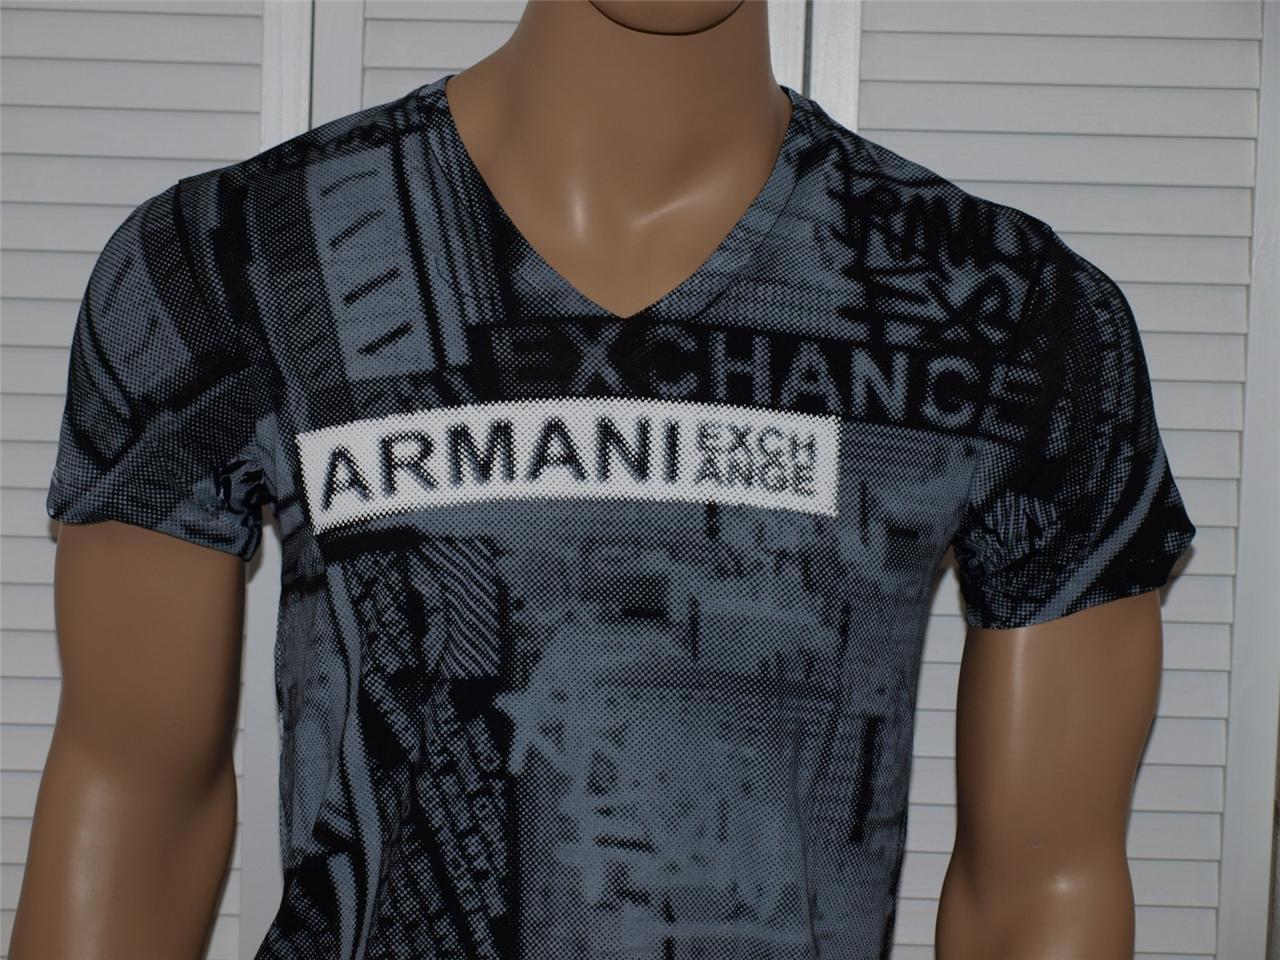 Black t shirt ebay - Image Is Loading Armani Exchange Allover City V Neck T Shirt